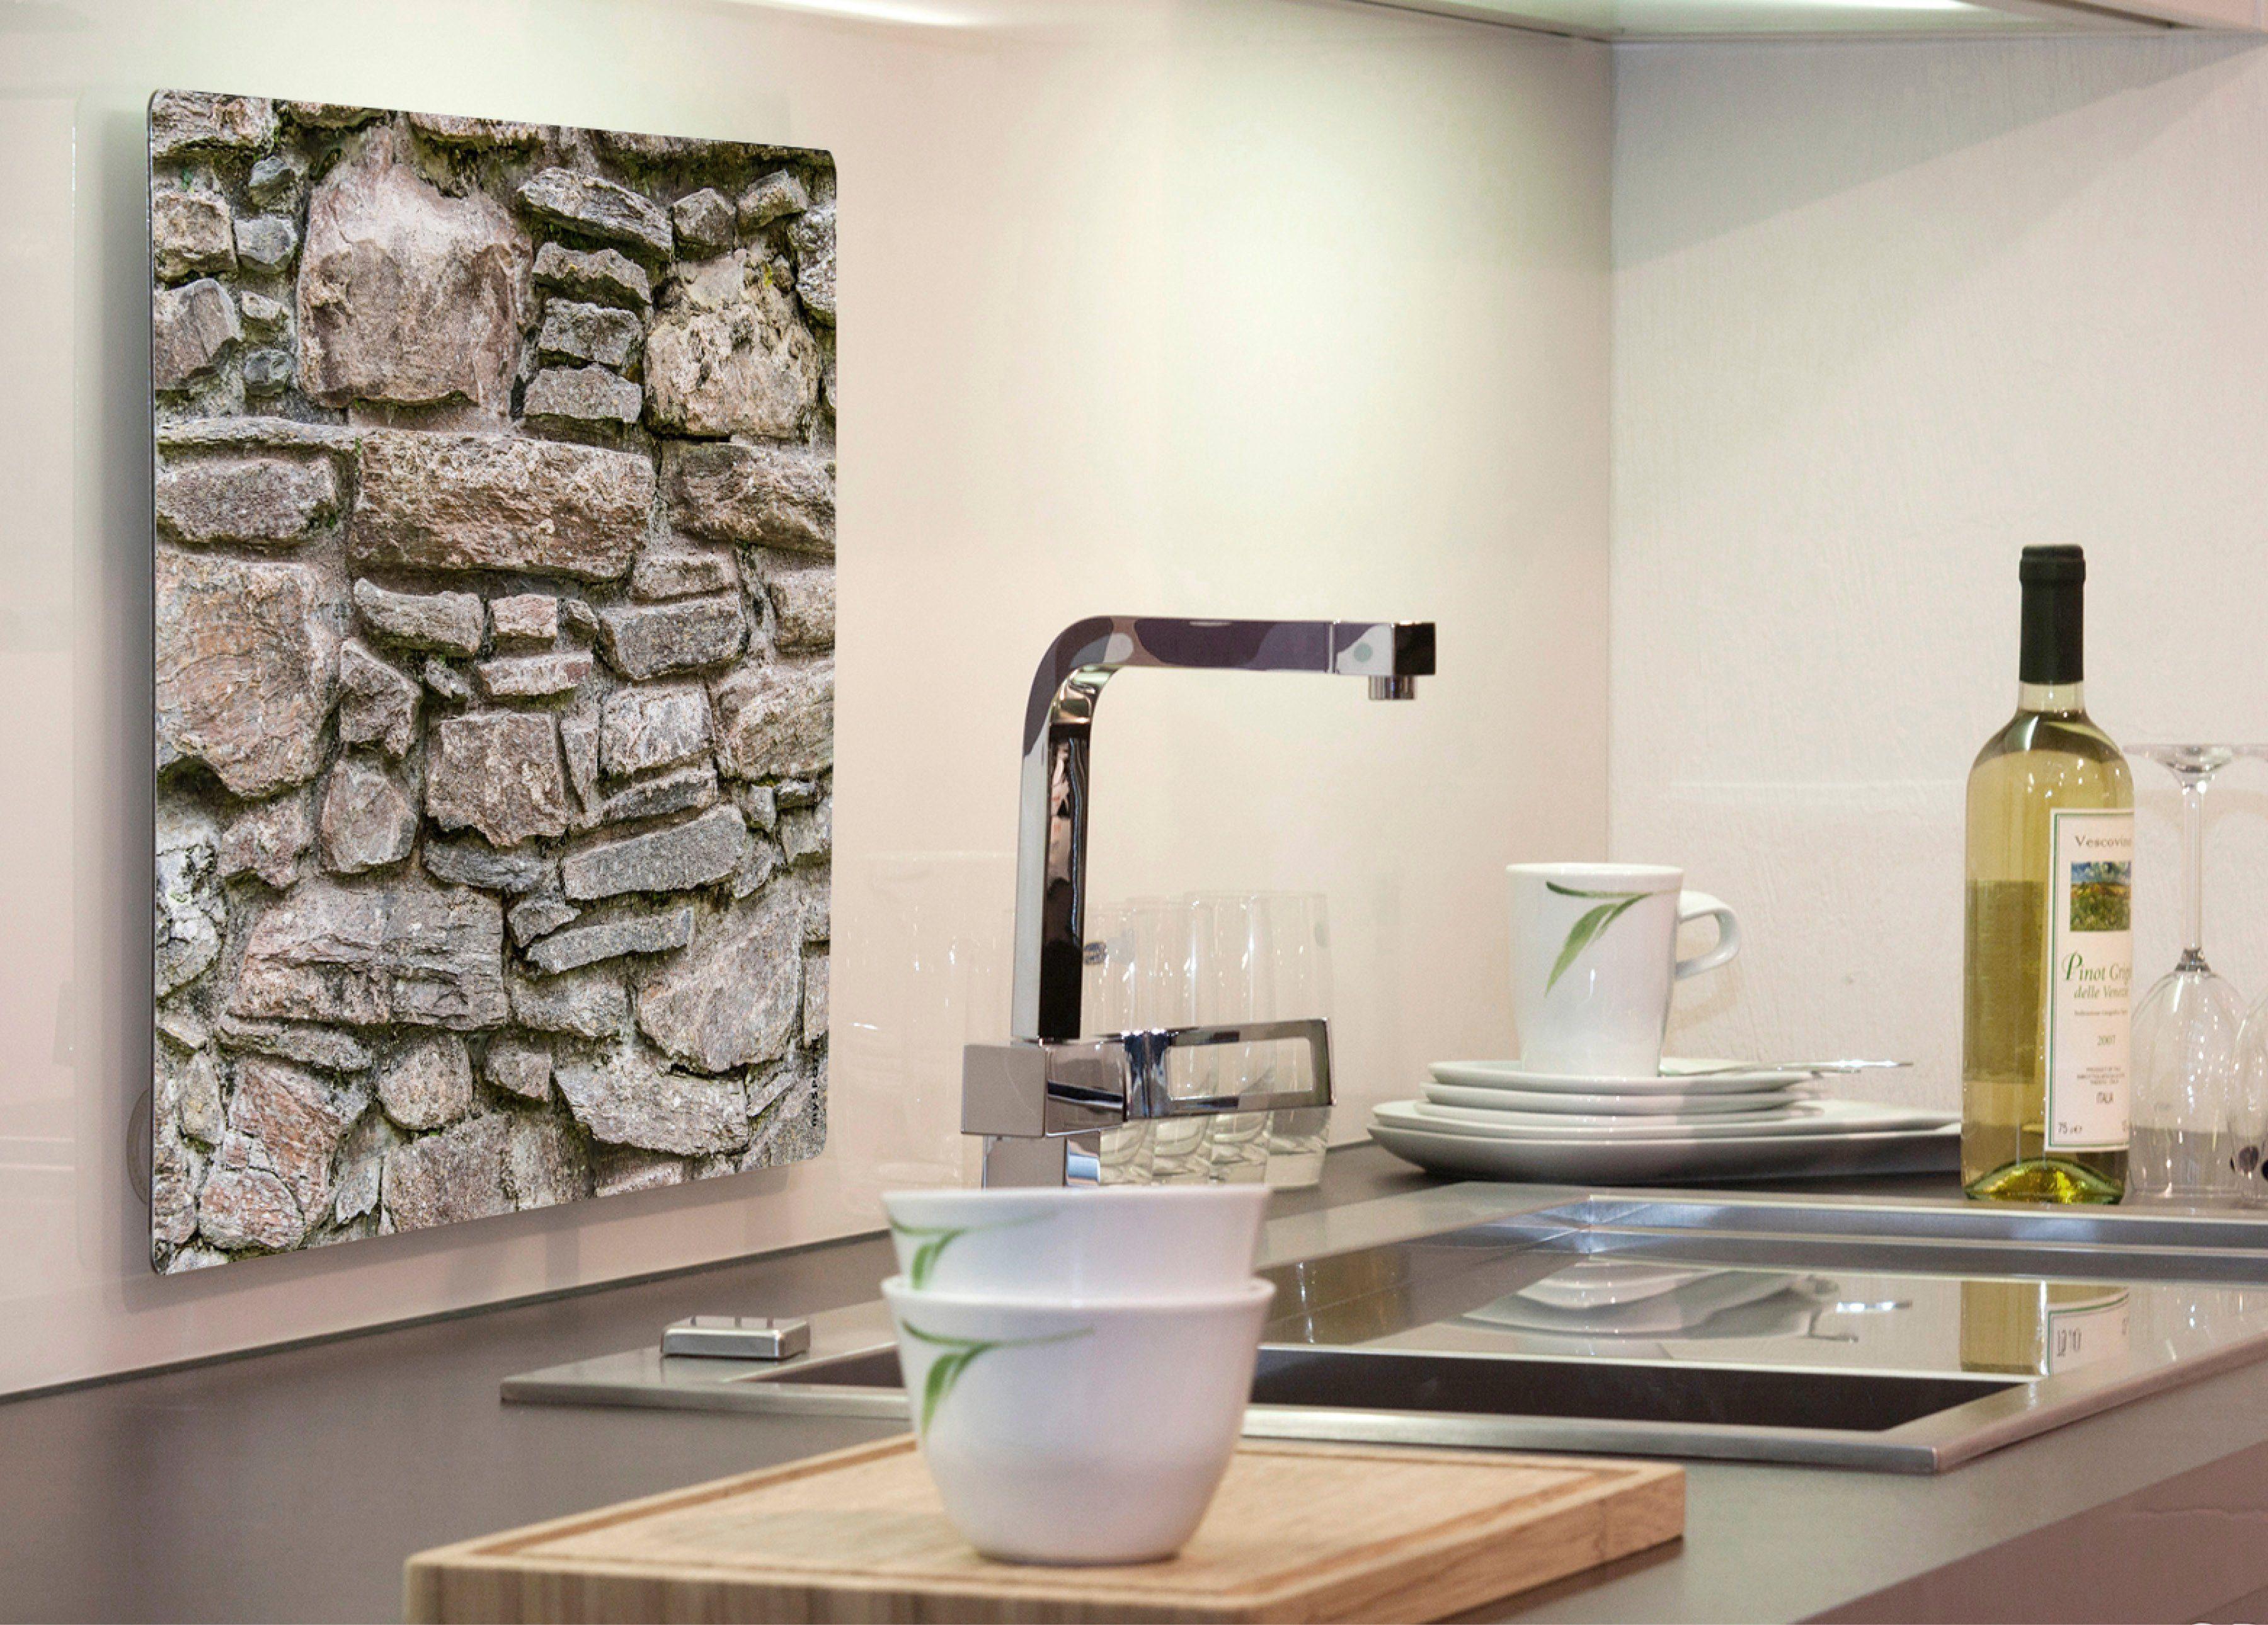 Küchenrückwand »pop«, Steinwand, 59x41 cm